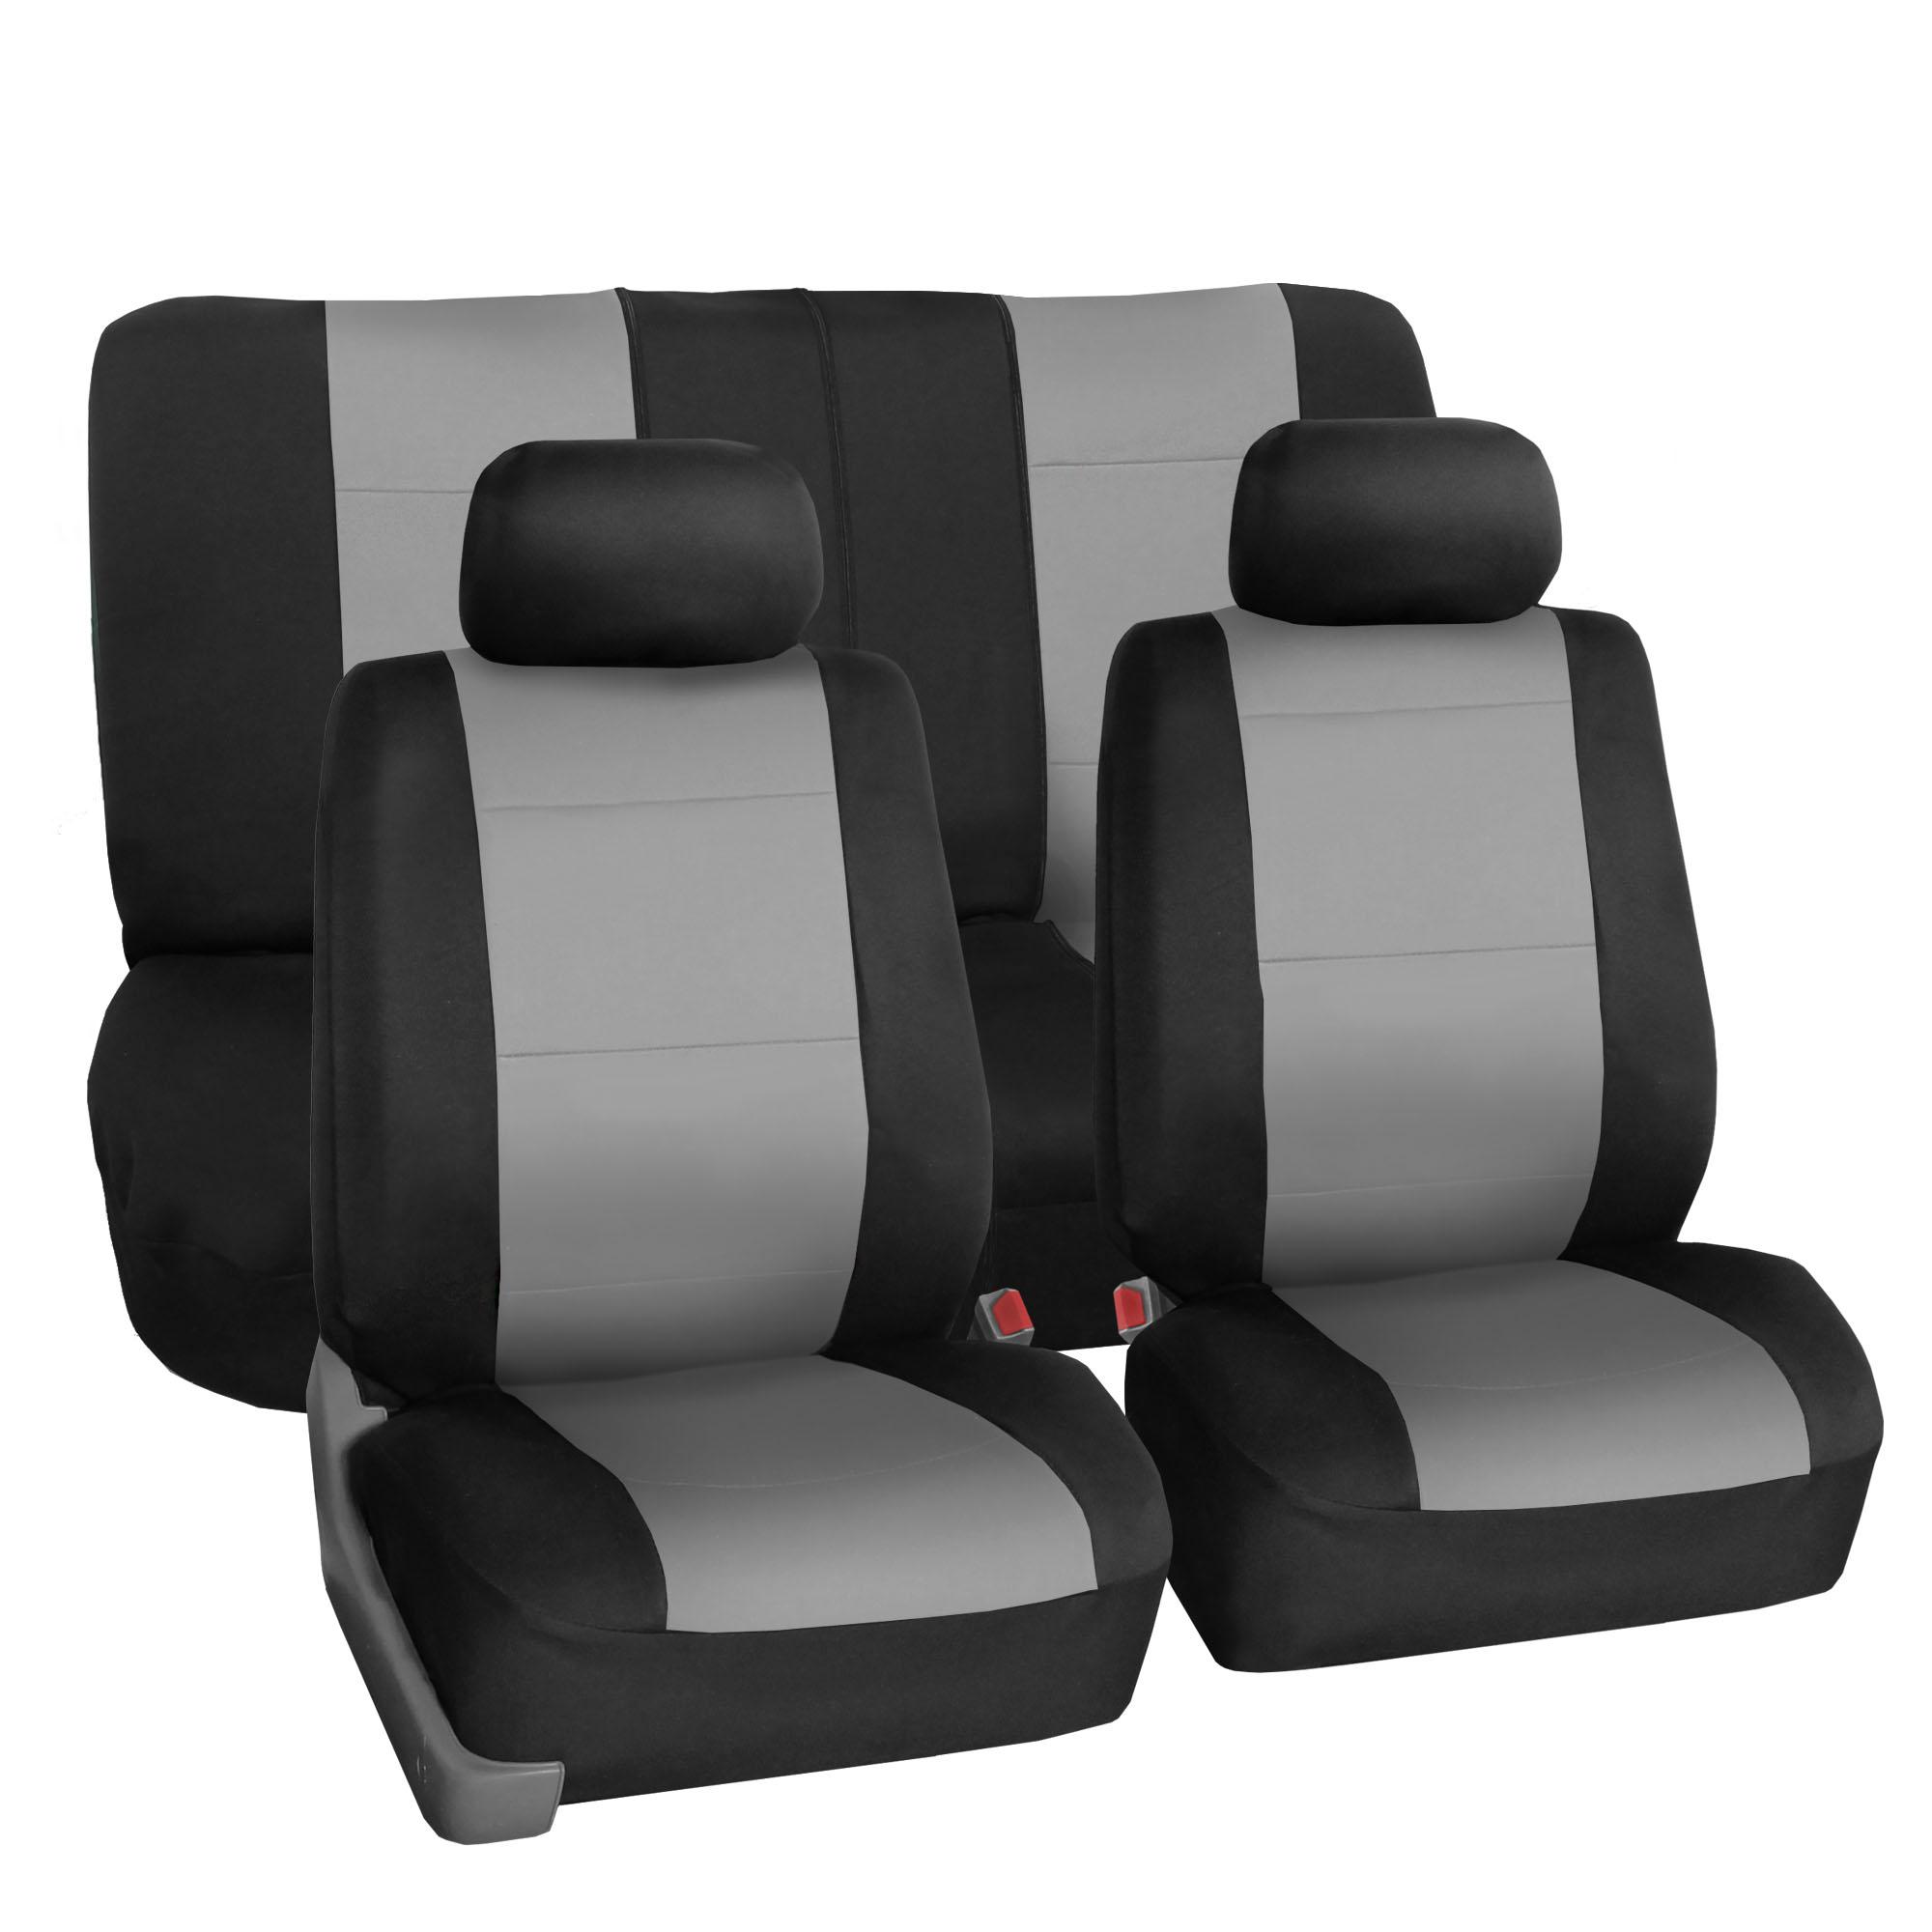 Car Seat Cover Neoprene Waterproof Pet Proof Full Set 2